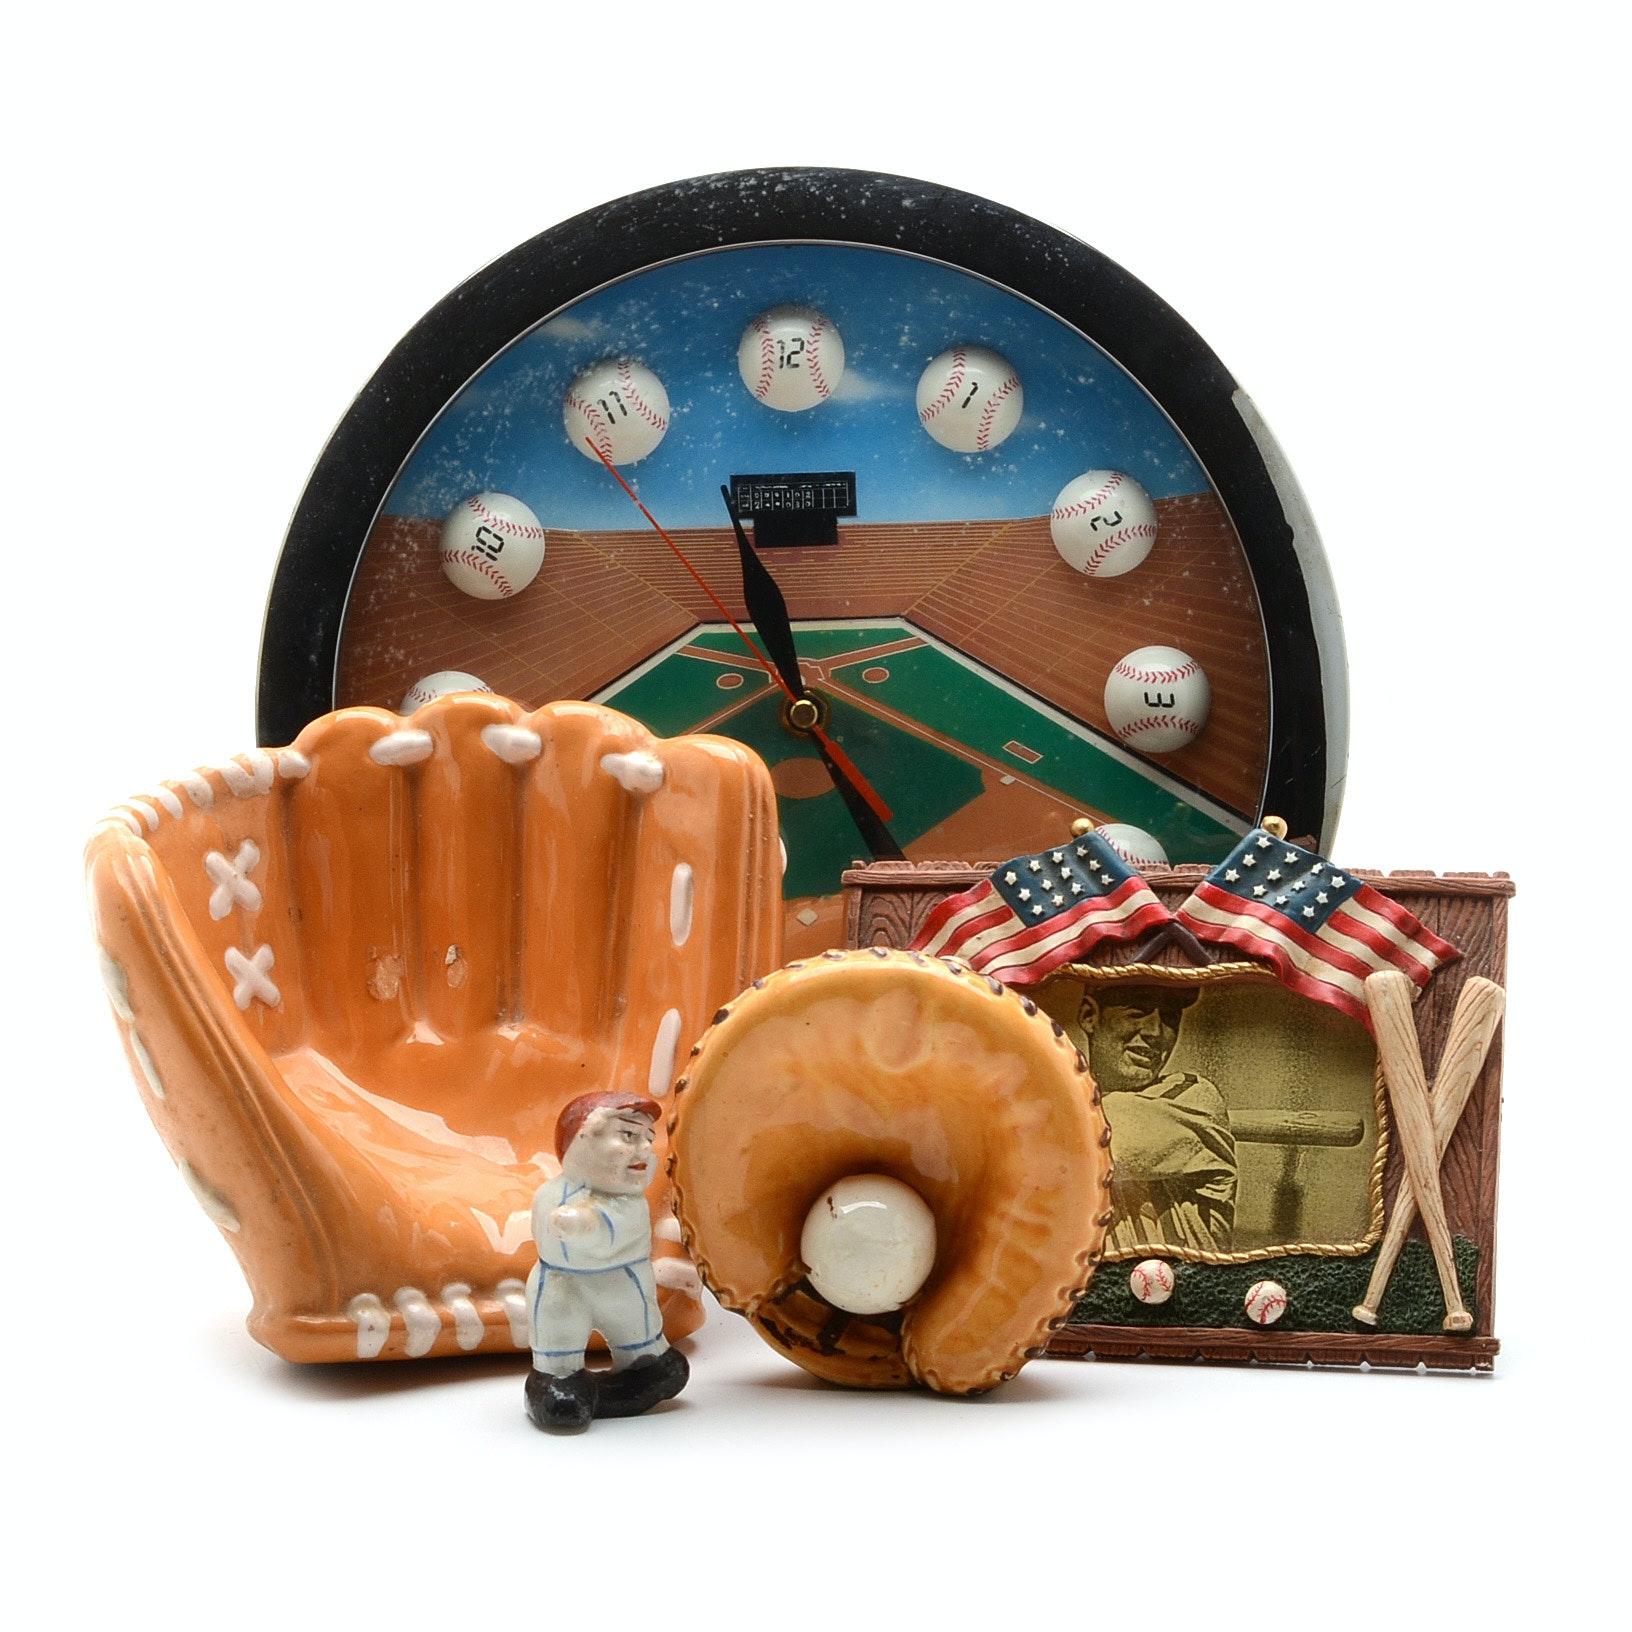 Baseball Wall Clock with Ceramic Gloves